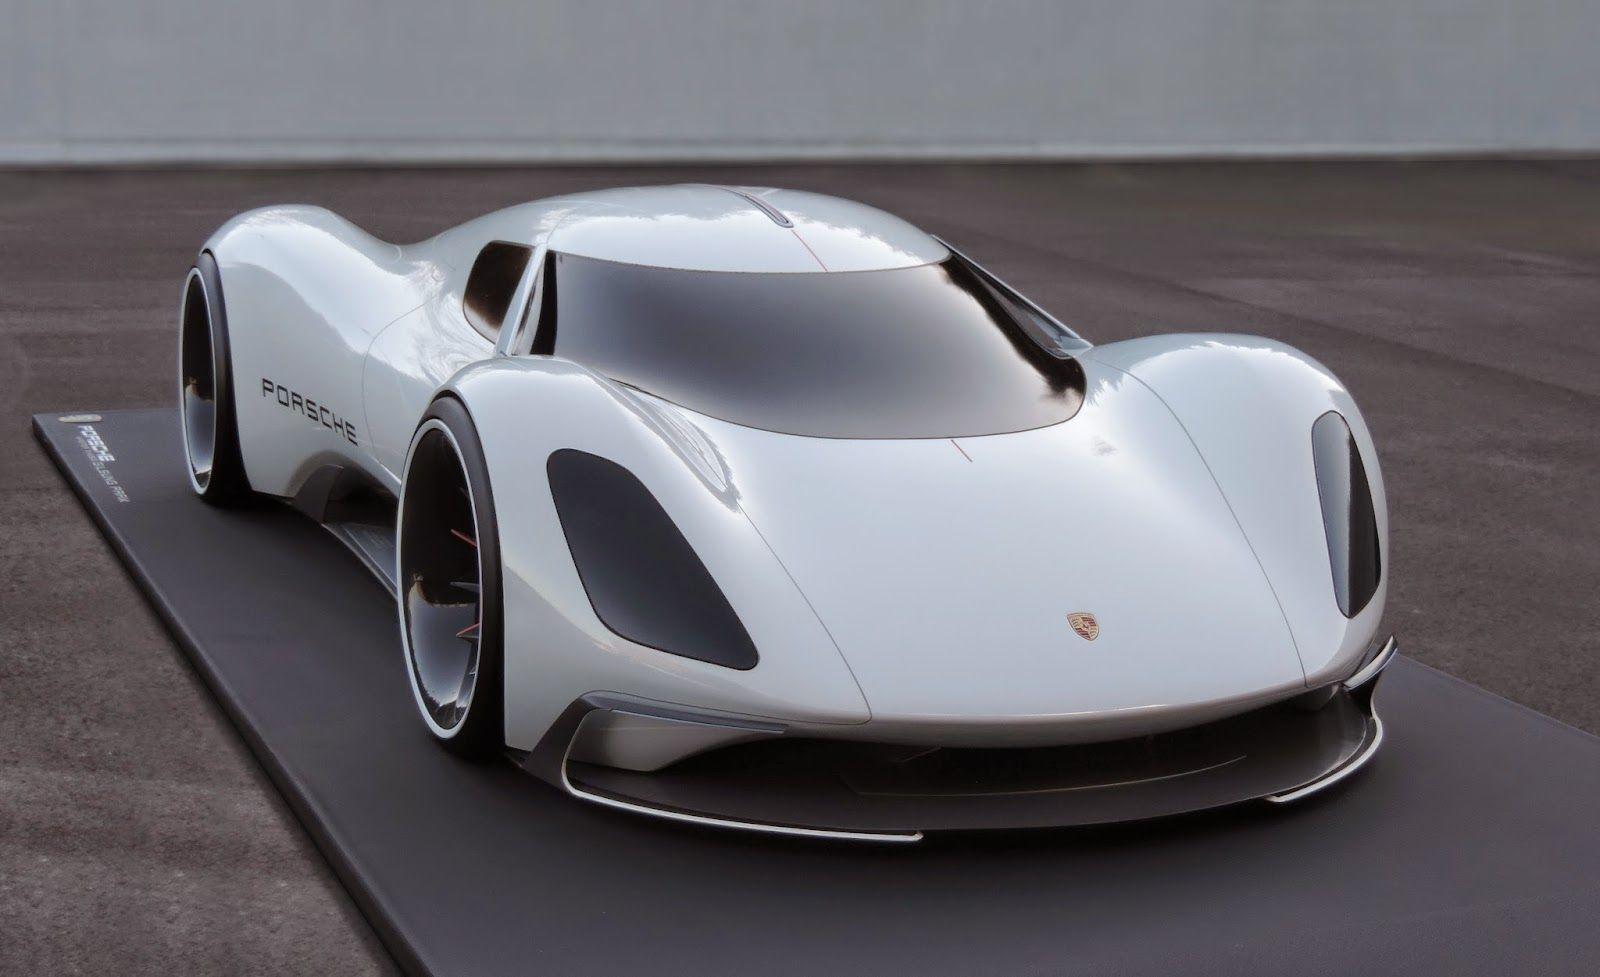 Porsche Electric Le Mans 2035 Prototype Front End No Car No Fun Muscle Cars And Power Cars Porsche Electric Porsche Sport Cars